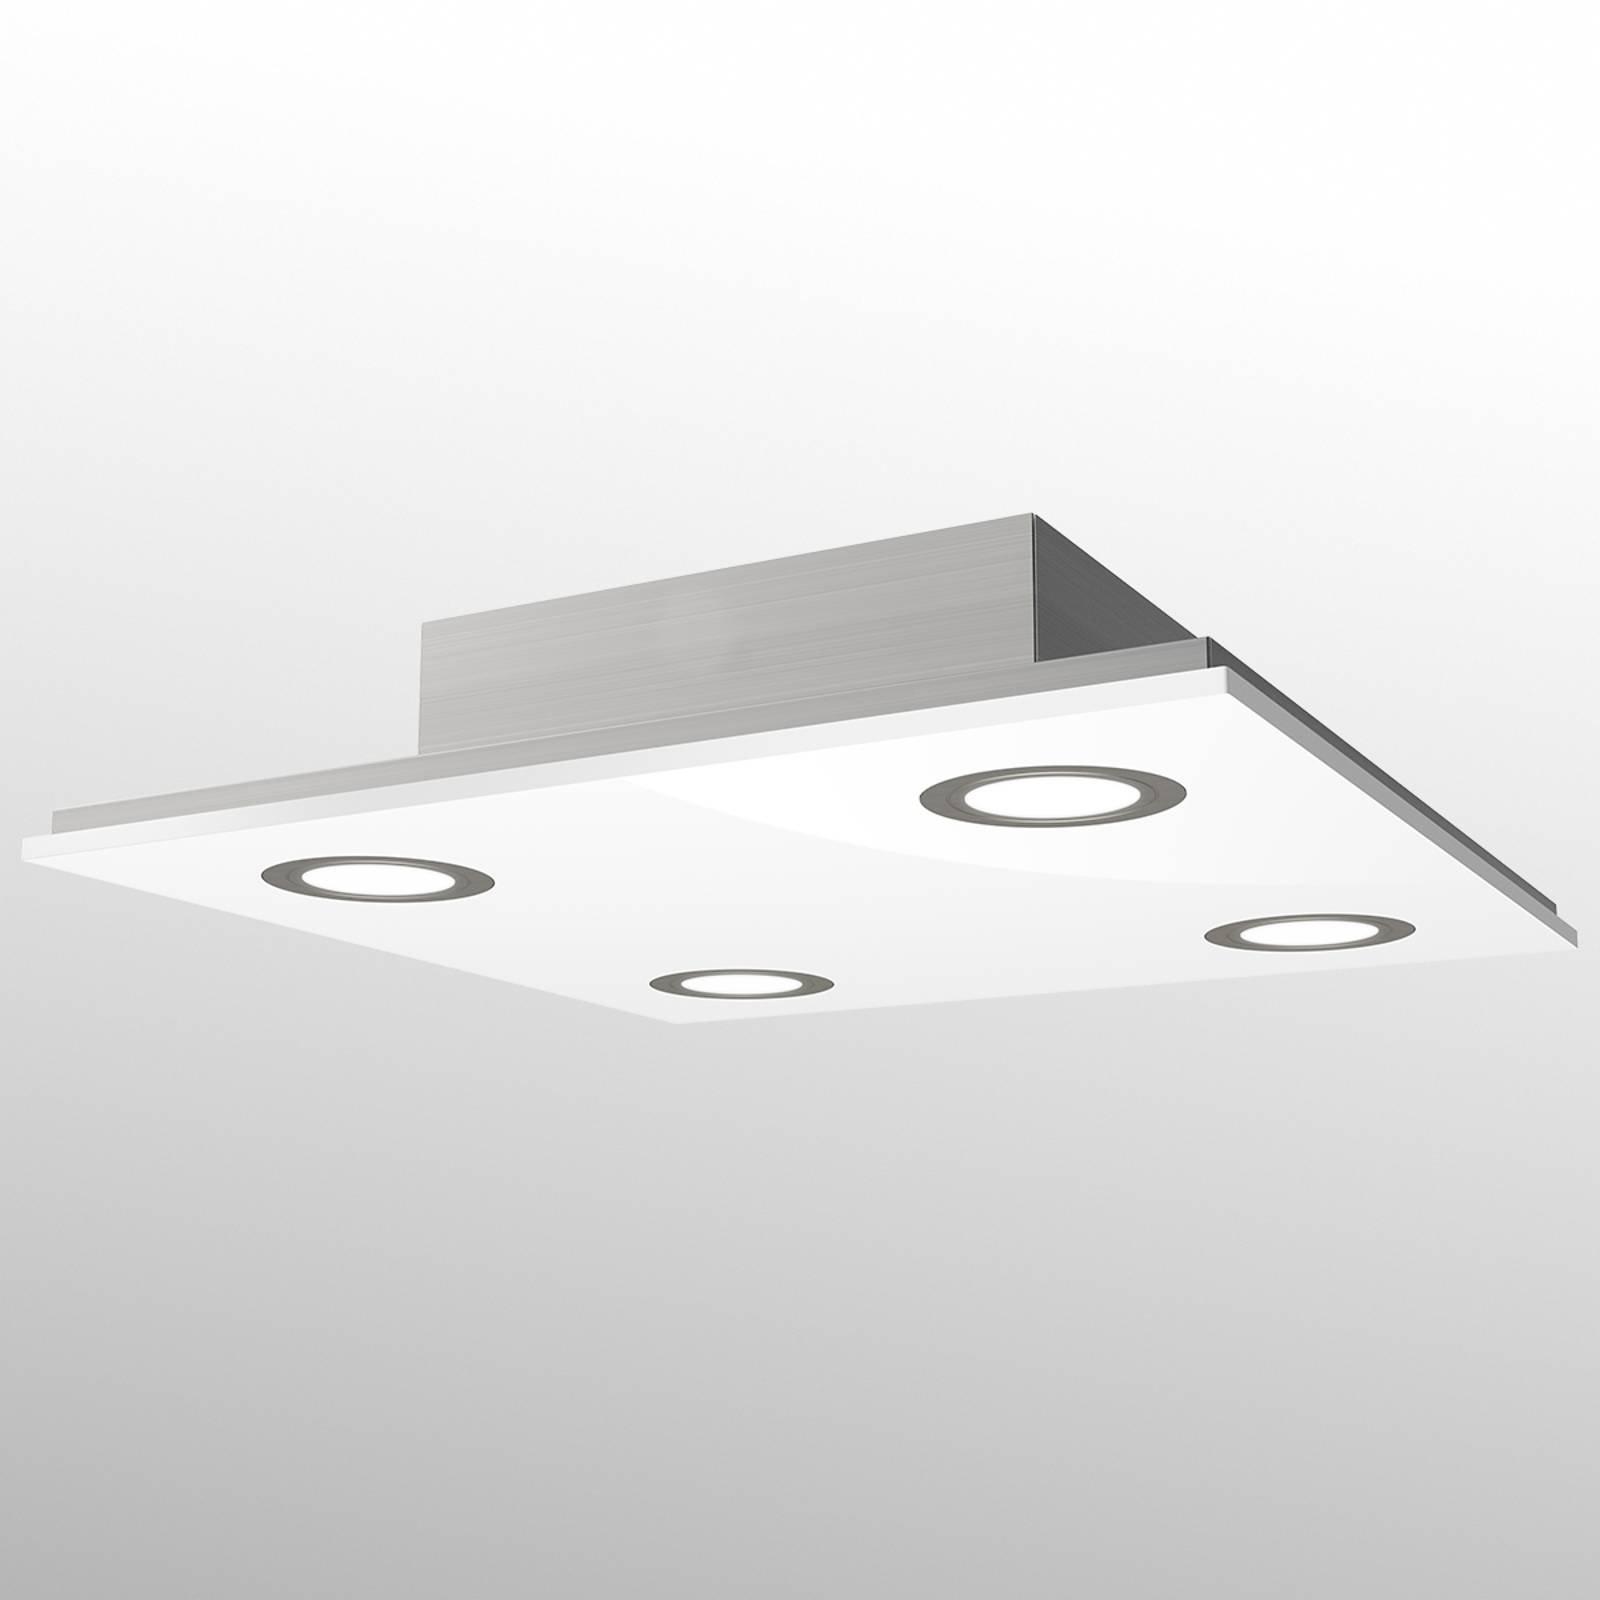 Kvadratisk LED-taklampe Pano, hvit